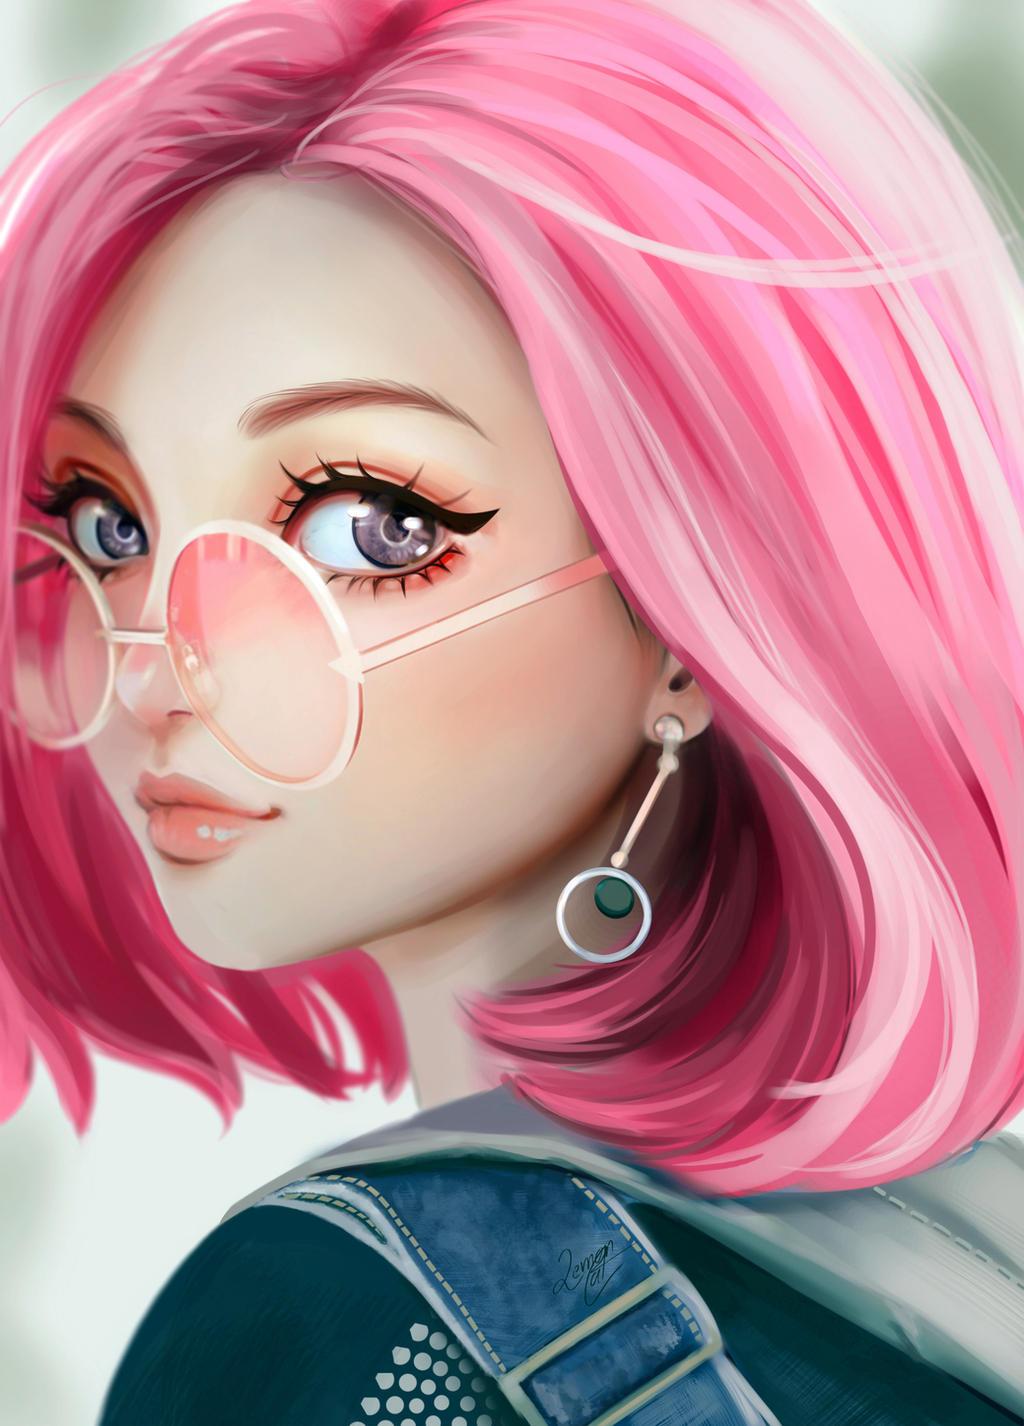 http://img07.deviantart.net/357f/i/2017/123/b/5/pink_by_yellowlemoncat-db7yhgo.jpg